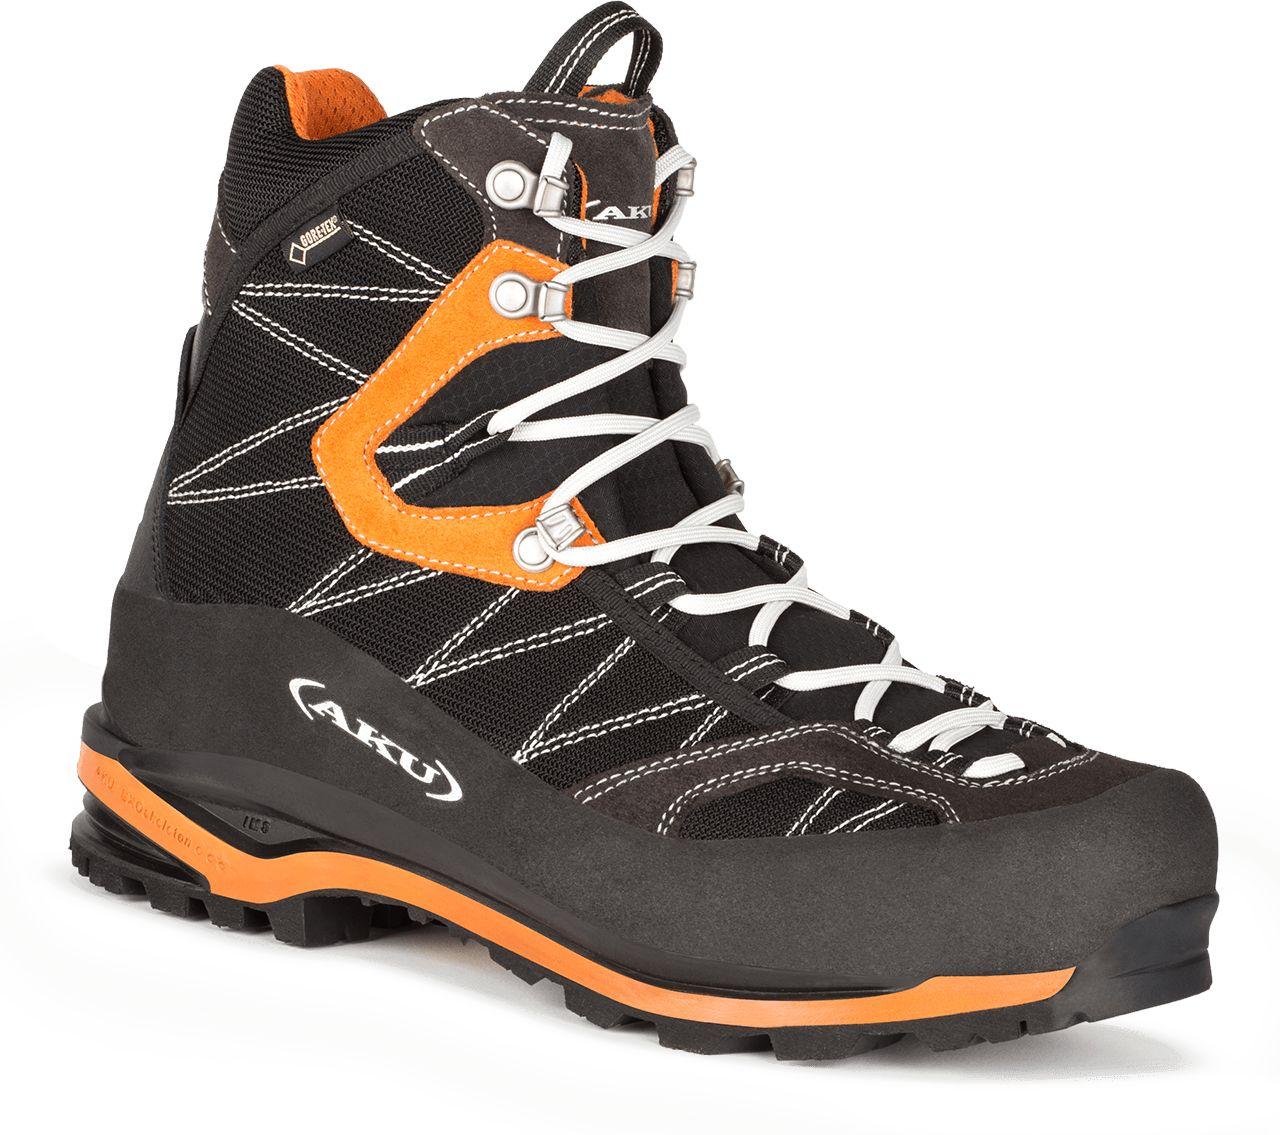 Aku Buty meskie Tangu Lite GTX black/ orange r. 44,5 975-108-10 Tūrisma apavi